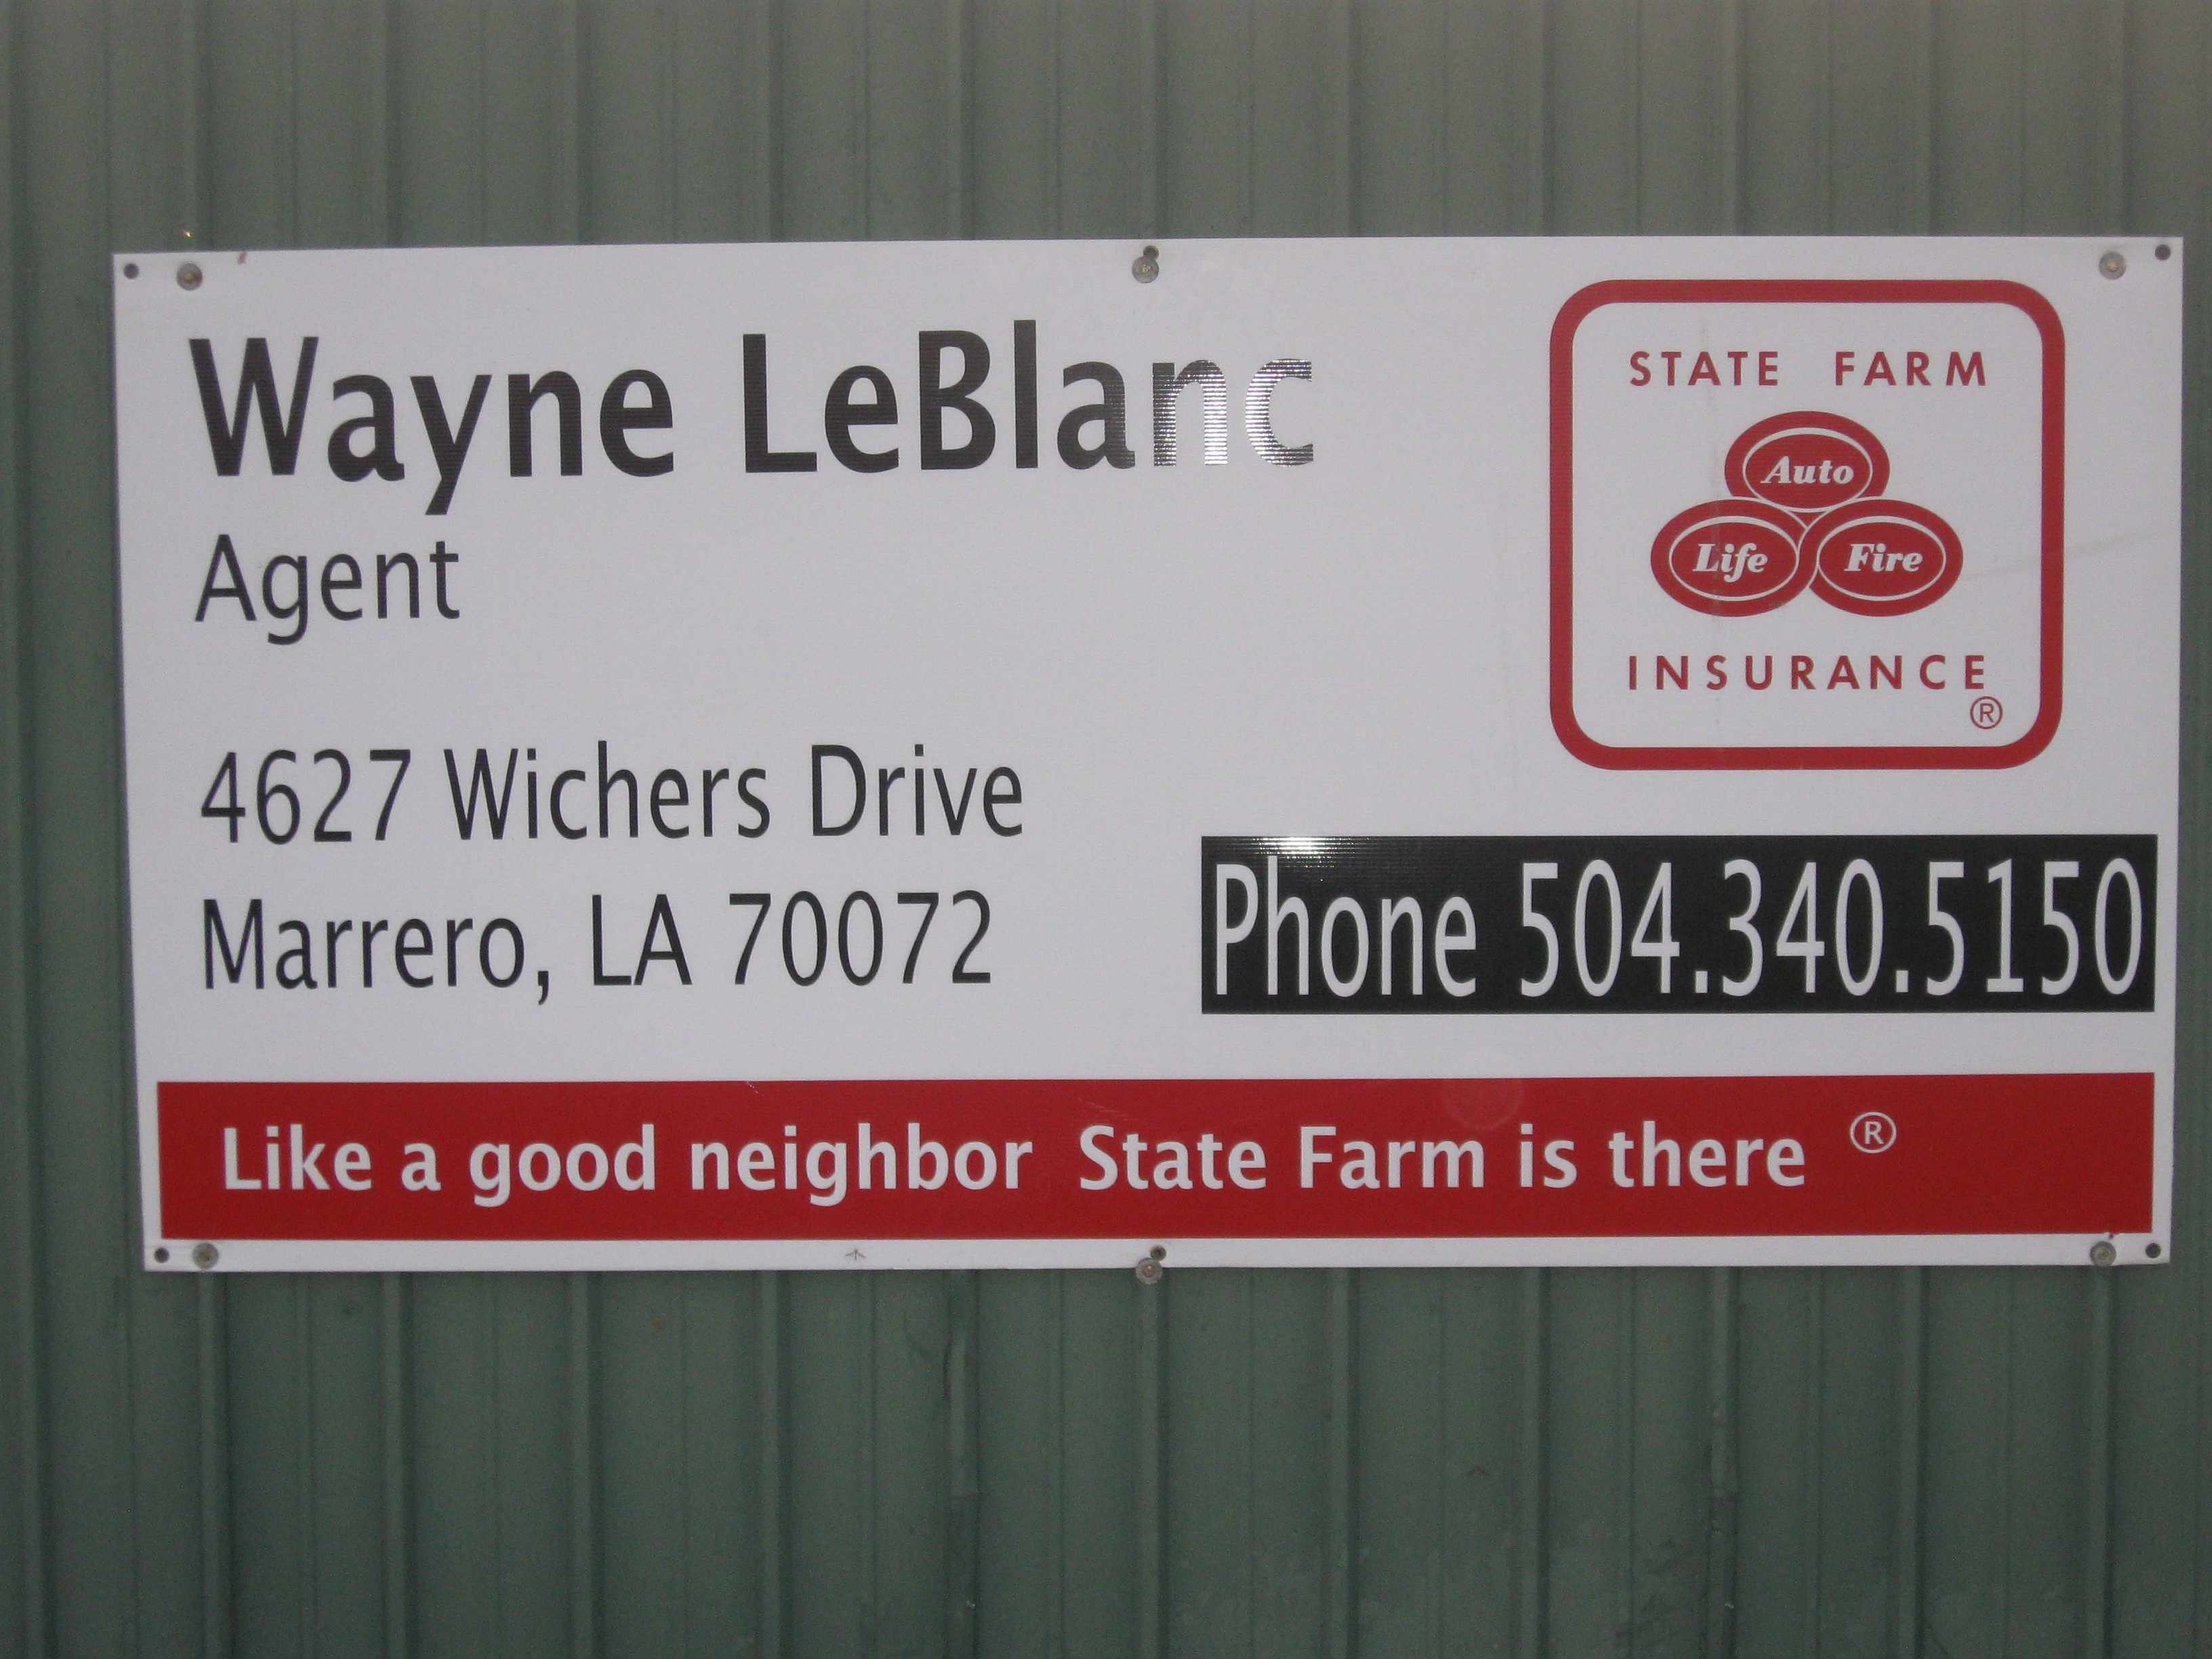 Wayne LeBlanc